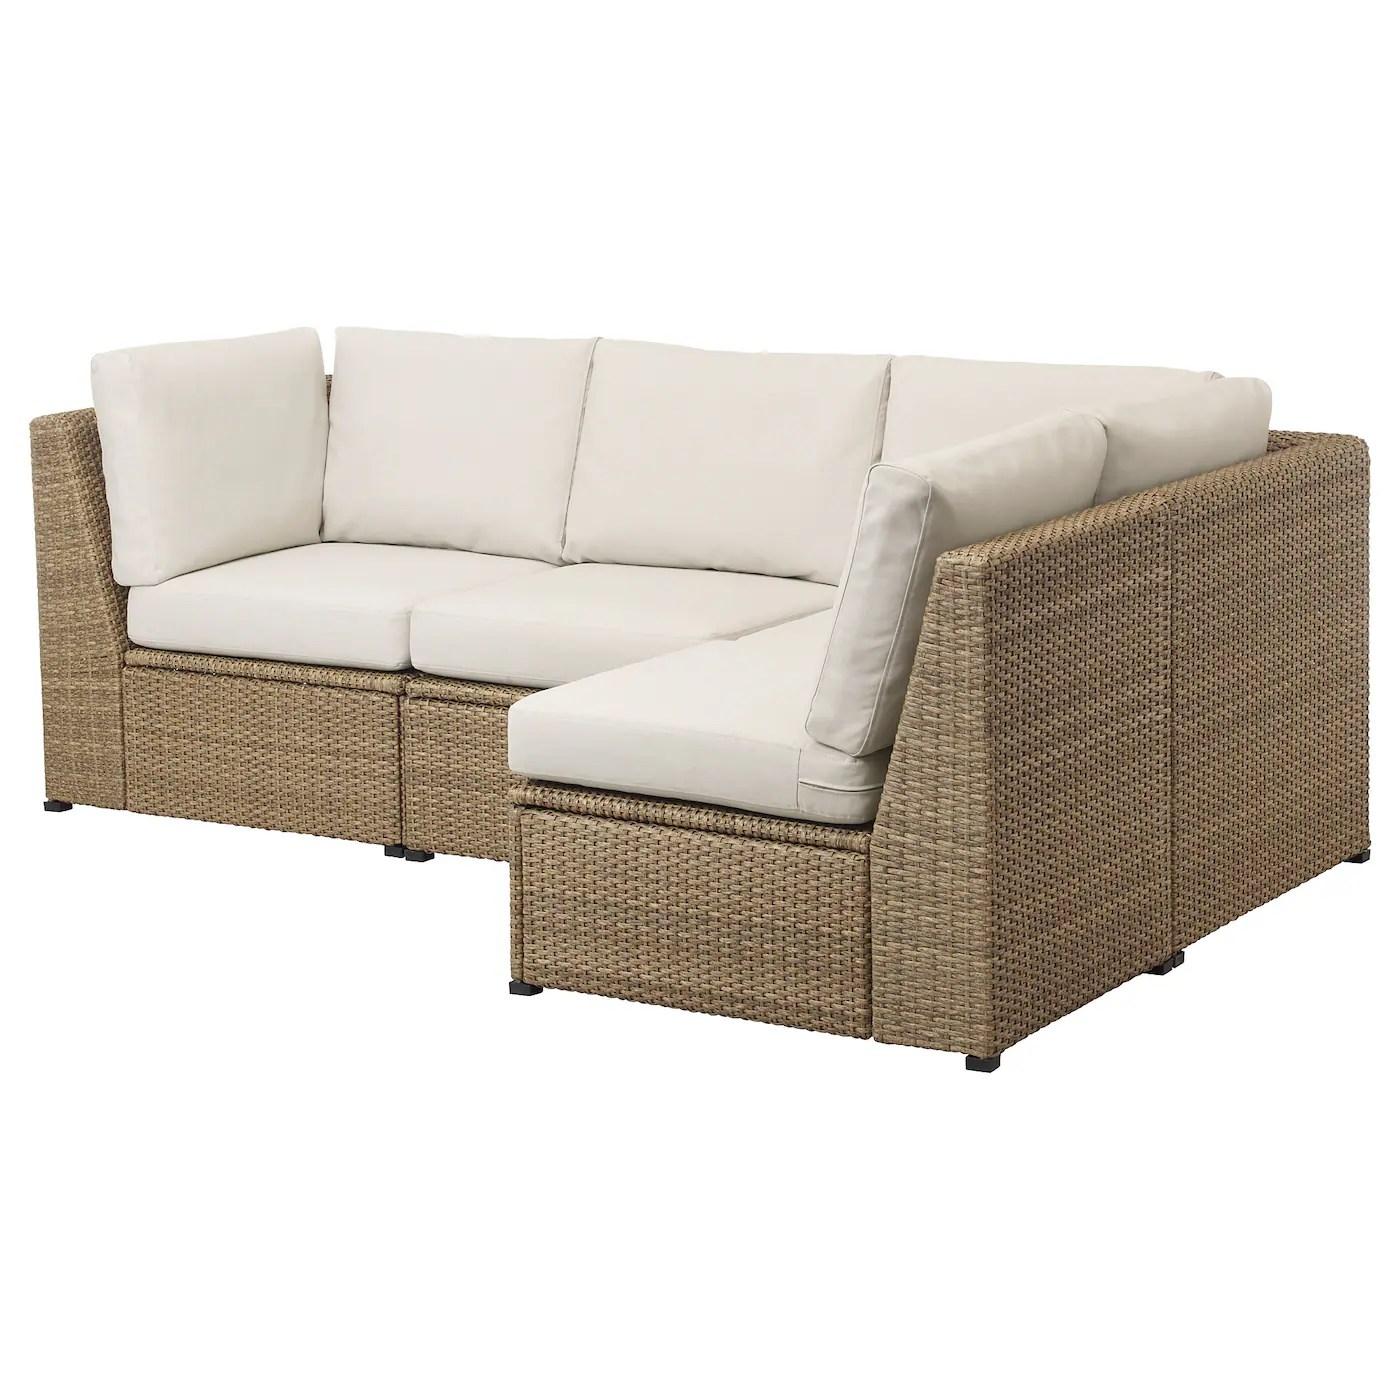 solleron modular corner sofa 3 seat outdoor brown froson duvholmen beige